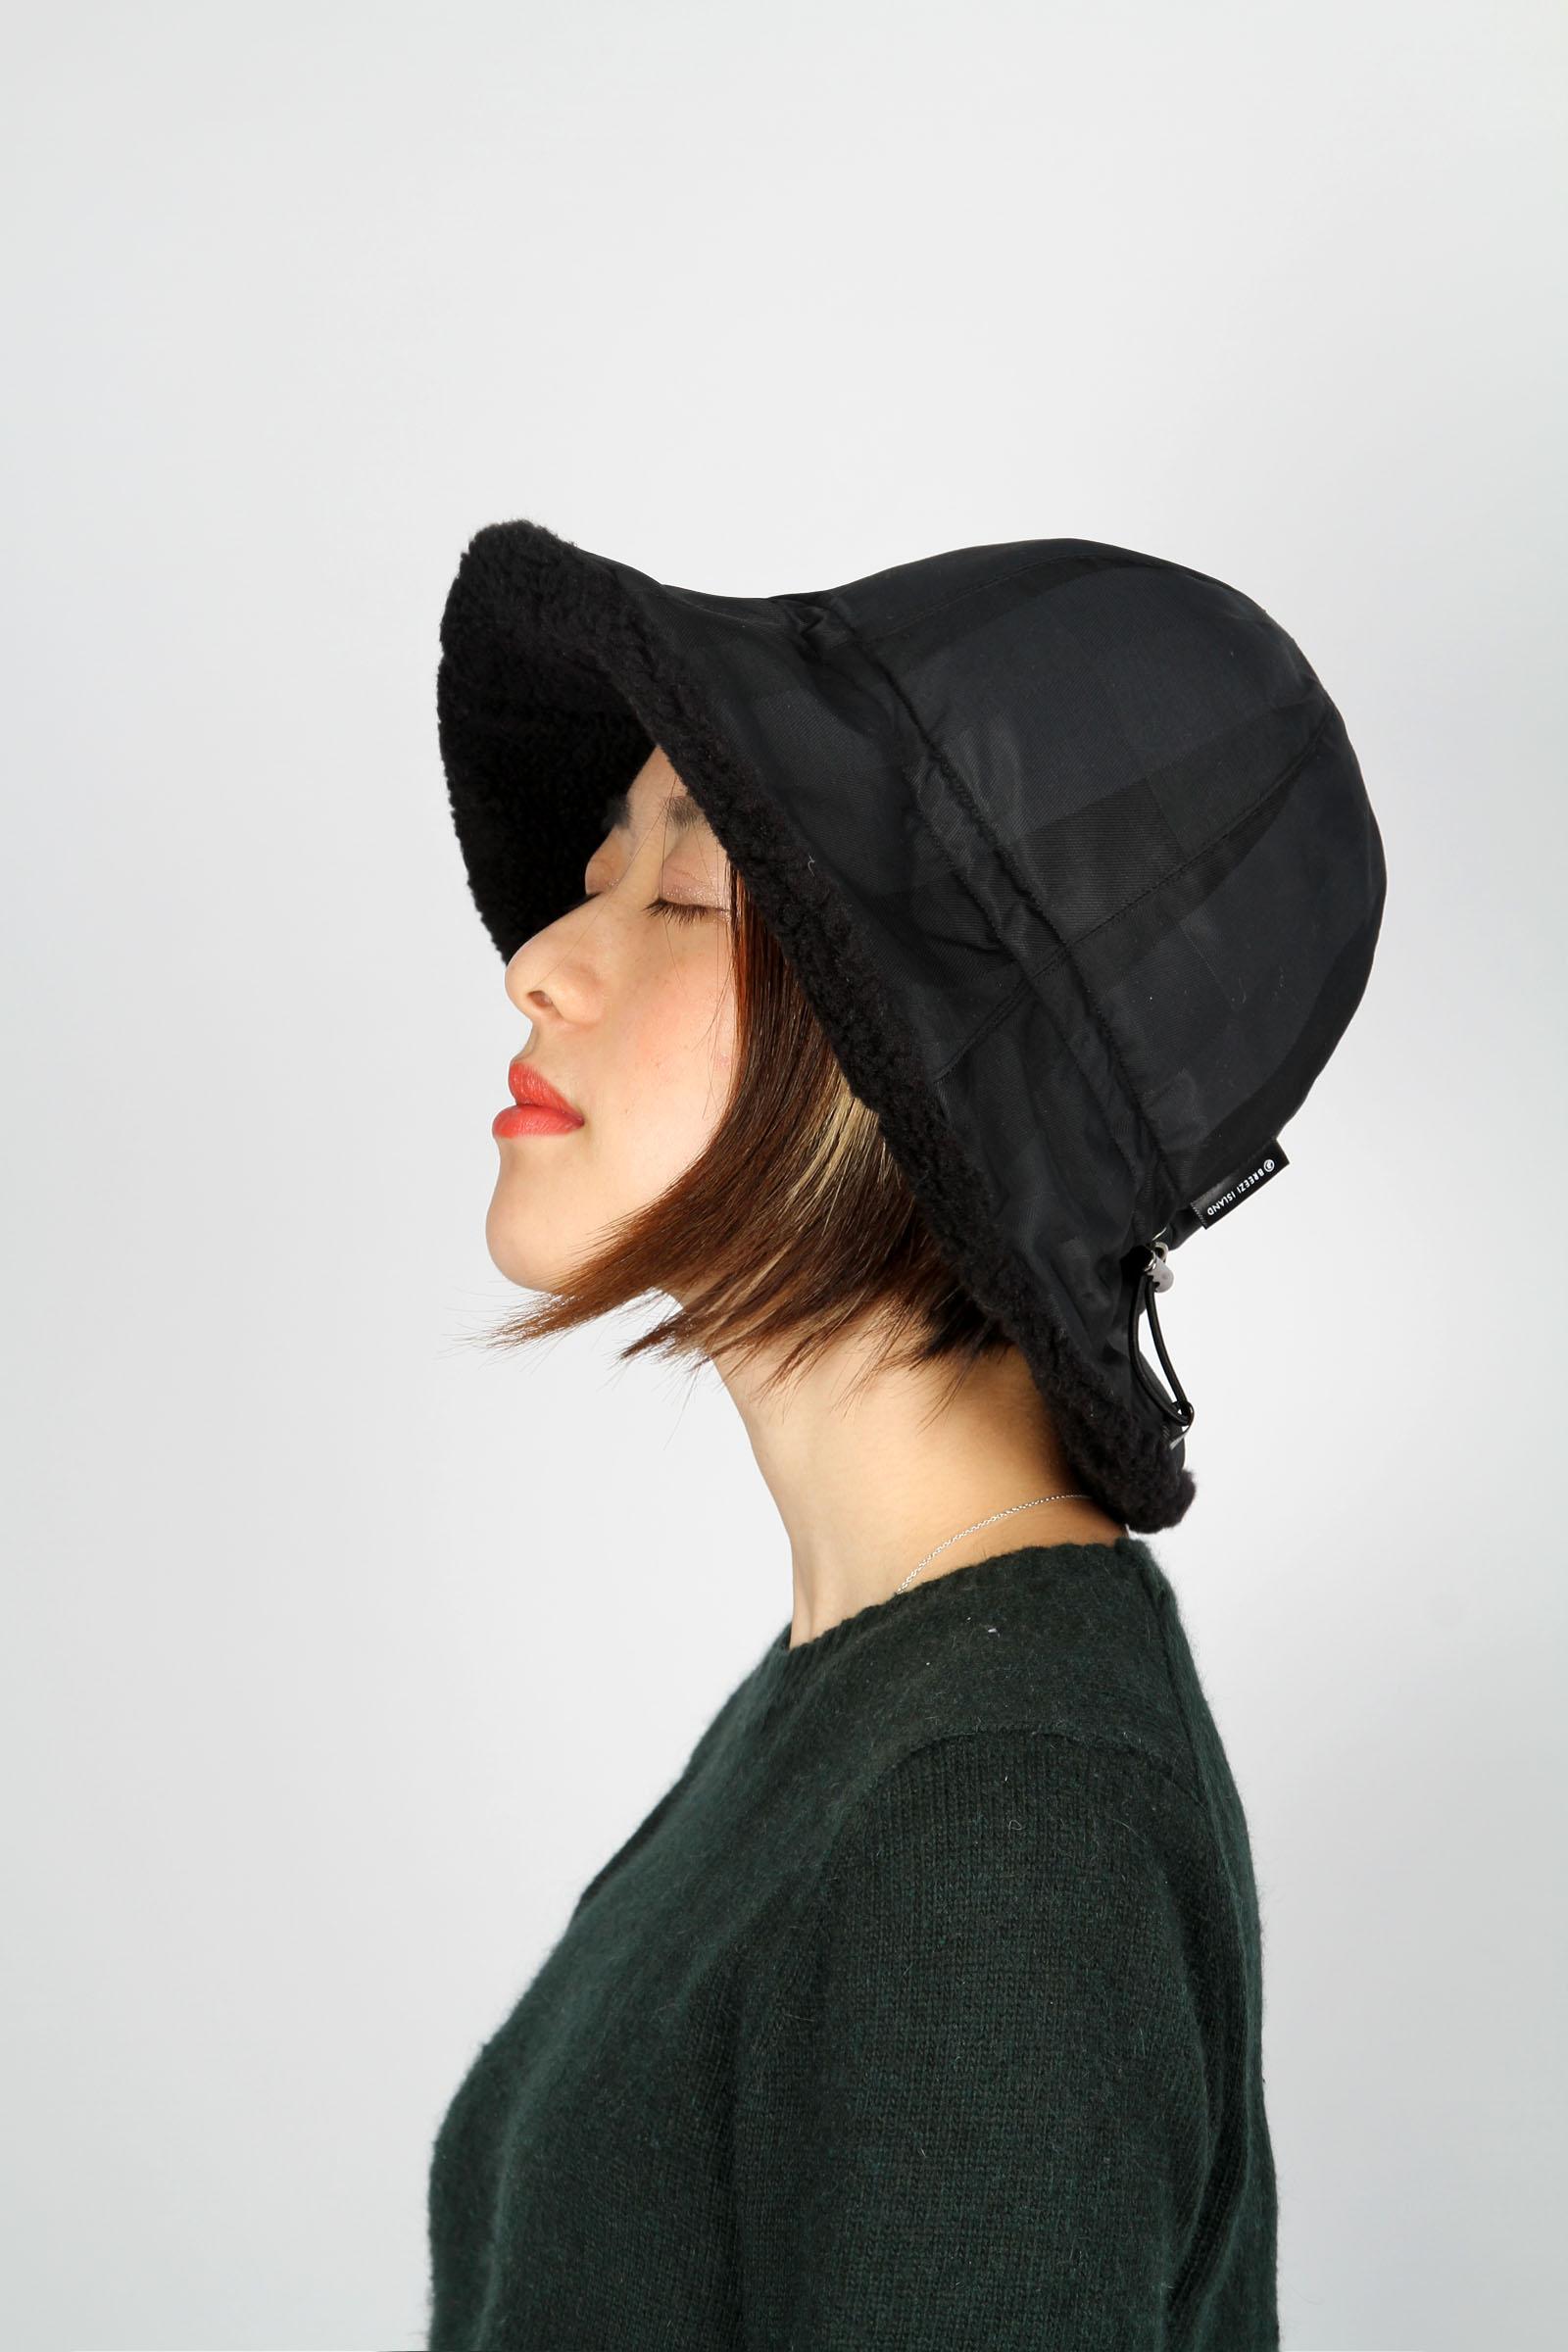 d6755a039e9 Waterproof storage fluff fisherman hat - Black Check - Designer ...